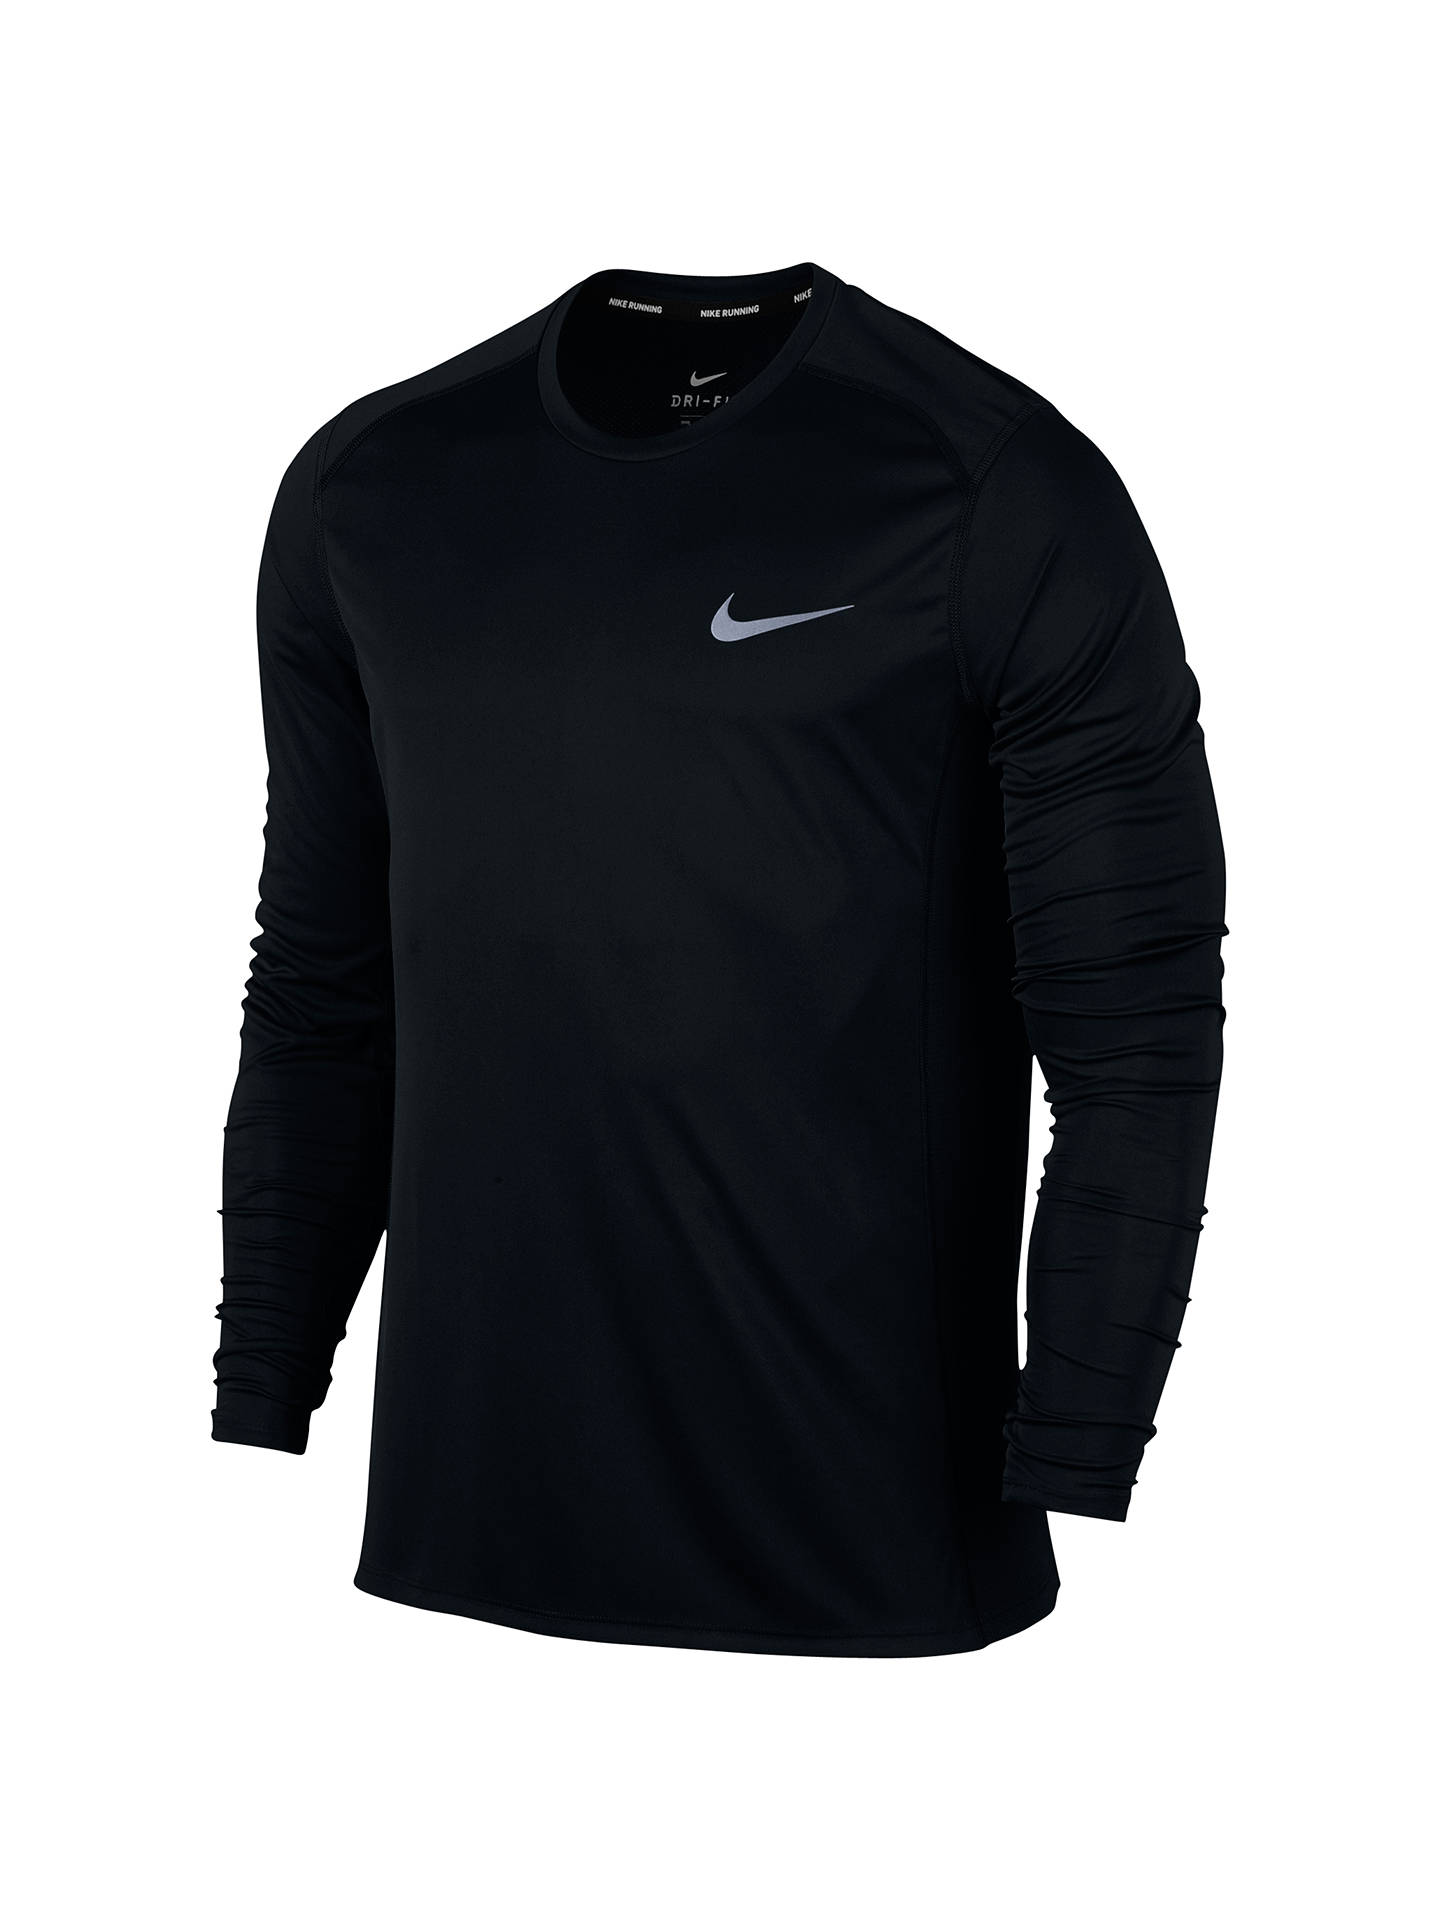 4308e2247dbe3 Buy Nike Dry Miler Long Sleeve Running Top, Black, S Online at johnlewis.